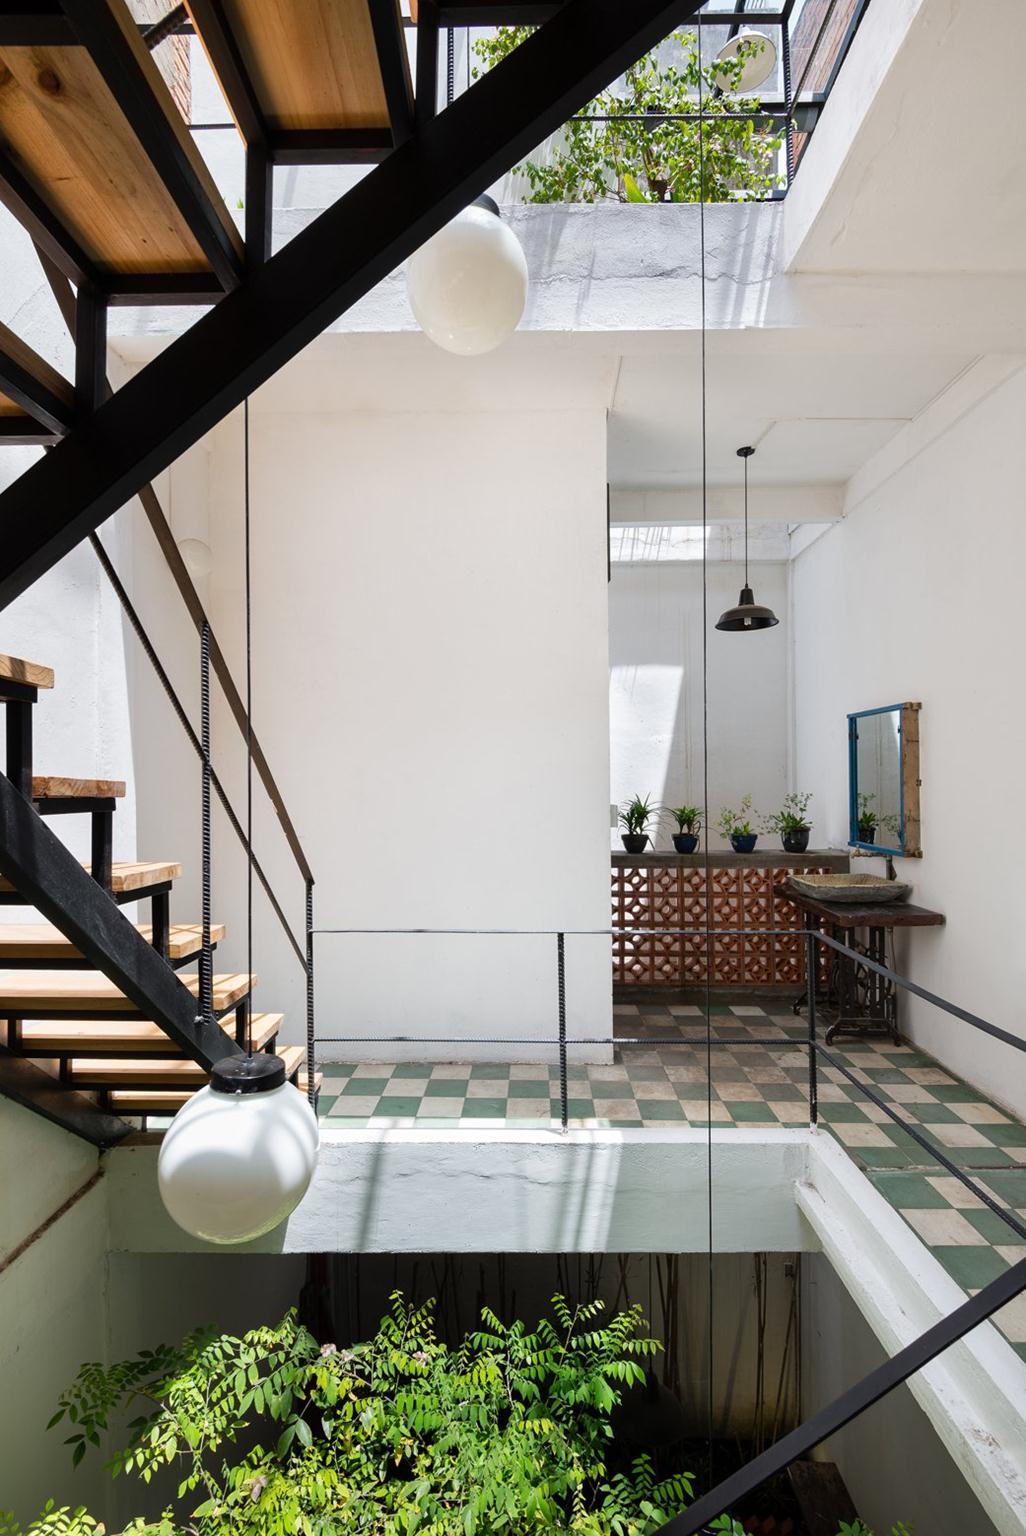 557a5ac1e58eced6280001f5_vegan-house-block-architects_10 (Copy)